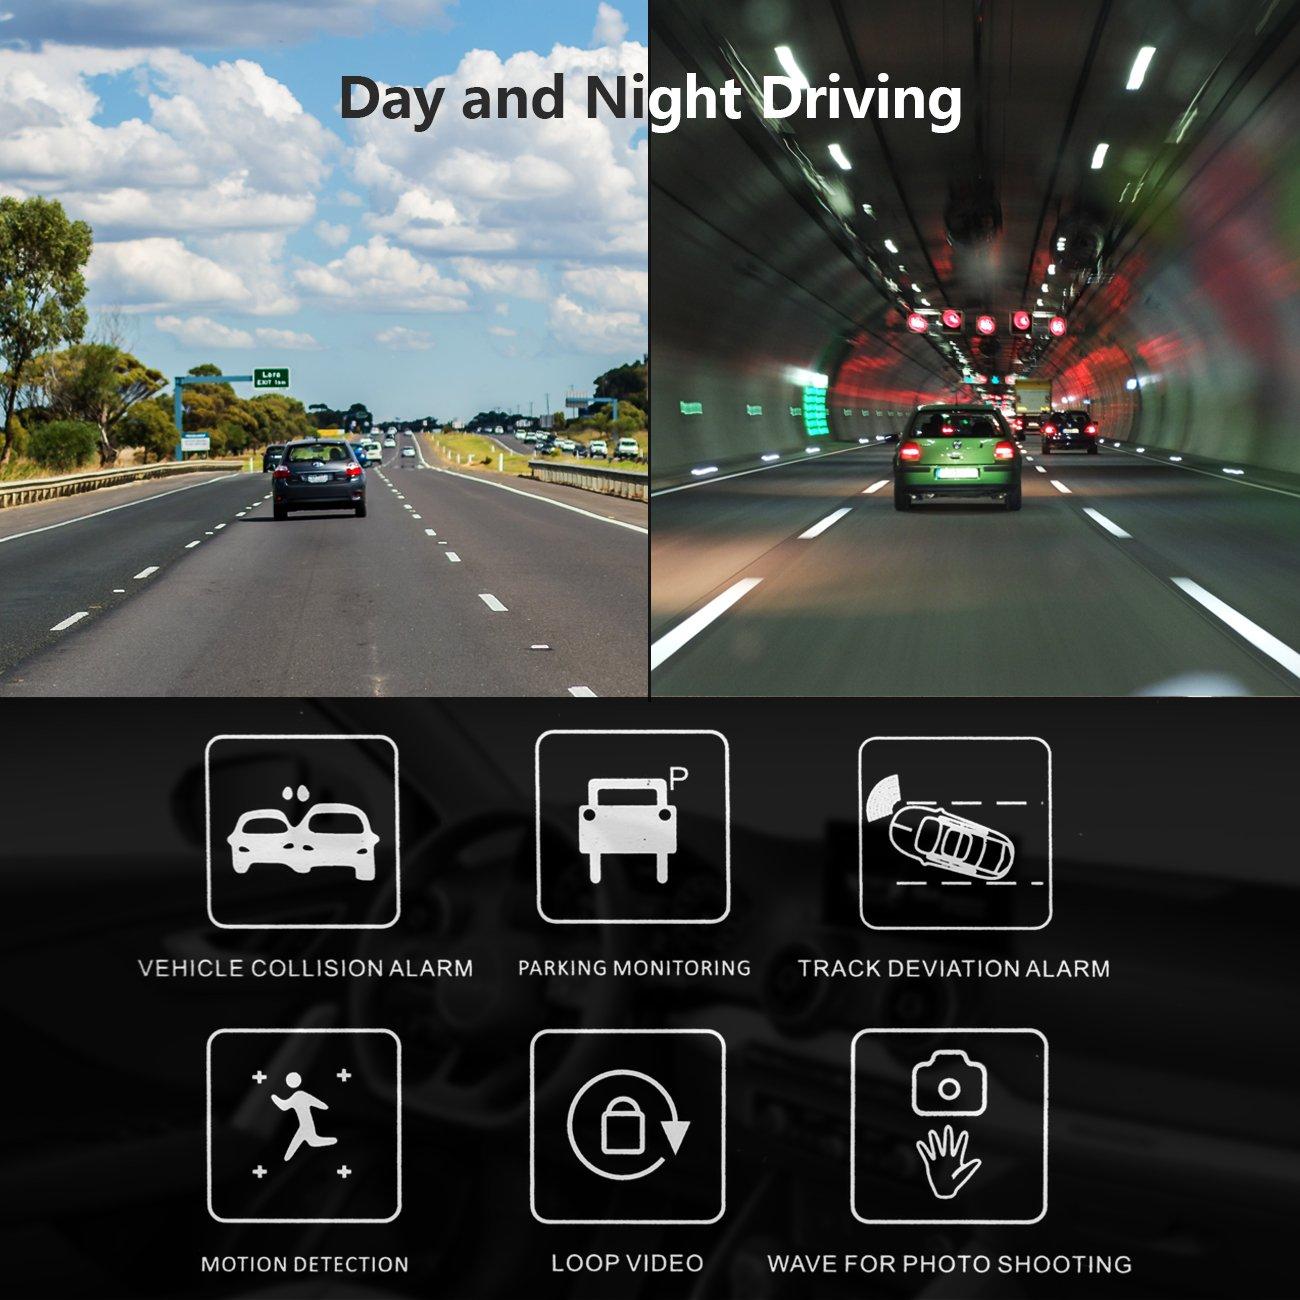 Car Dash Cam, Car Recorder 1080P FHD Gesture Sensor Camera 170 Degree Wide Angle Dashboard Camera Recorder with Sony Exmor Video Sensor, G-Sensor, WDR, Loop Recording, Night Mode,Parking Mode